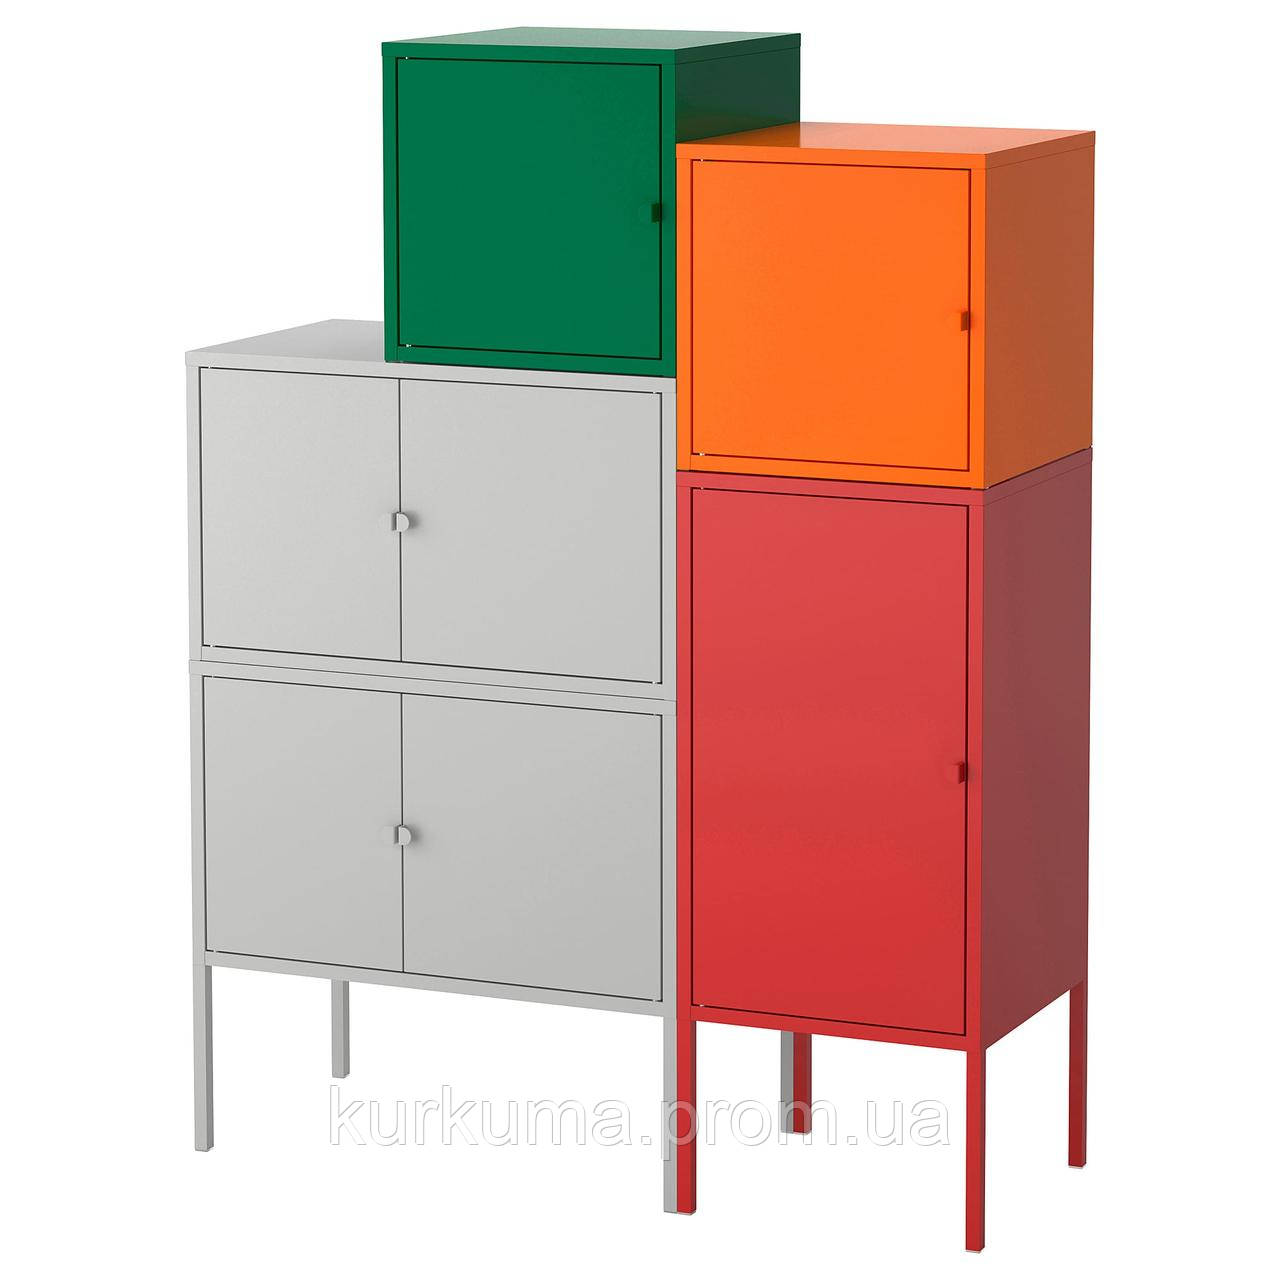 IKEA LIXHULT Шкаф, серый темно-зеленый, красный/оранжевый  (092.489.16)